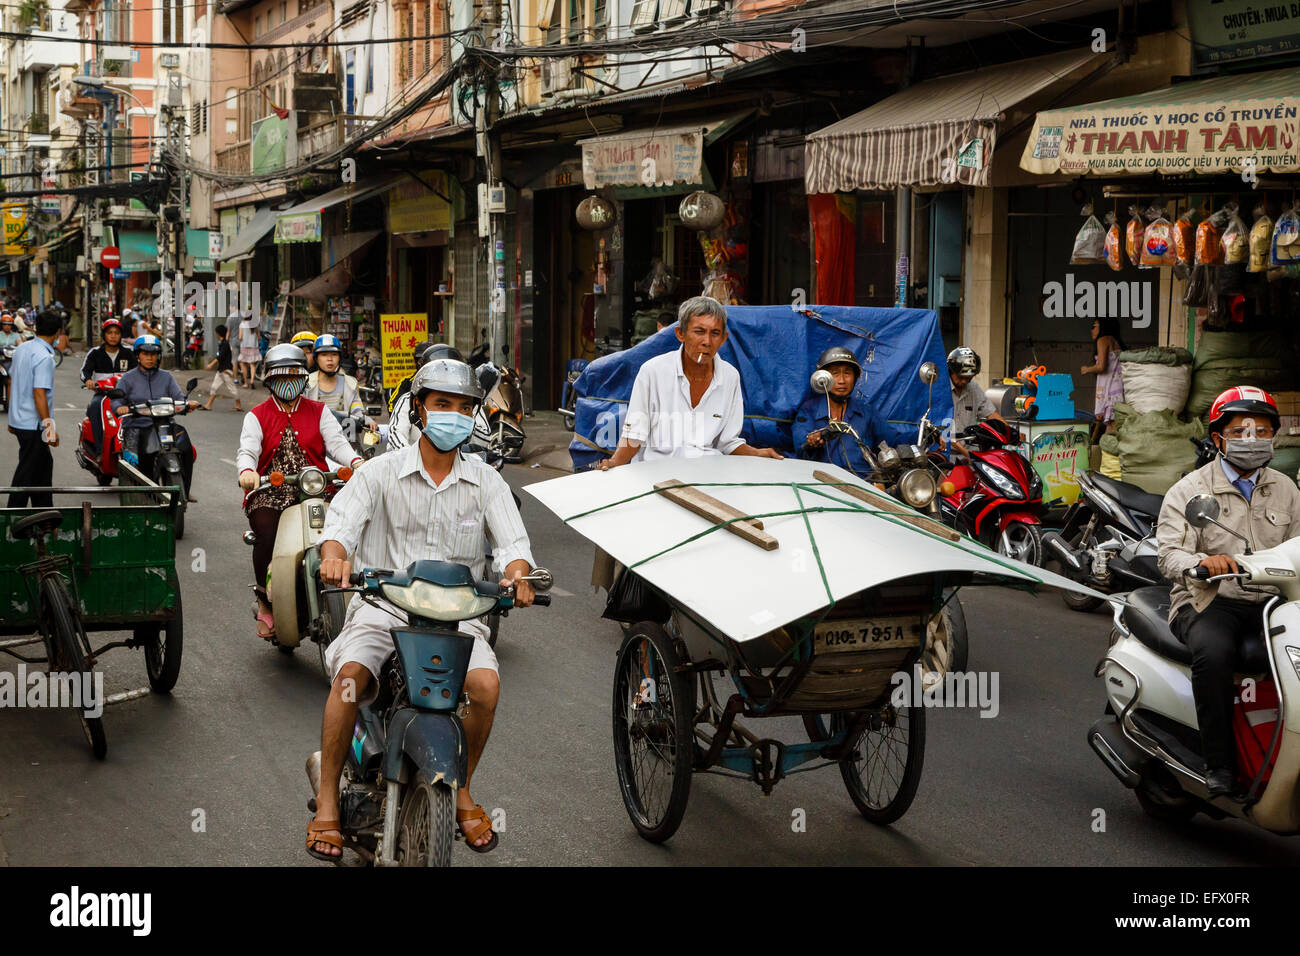 Busy traffic in Cholon (china town), Ho Chi Minh City (Saigon), Vietnam. - Stock Image